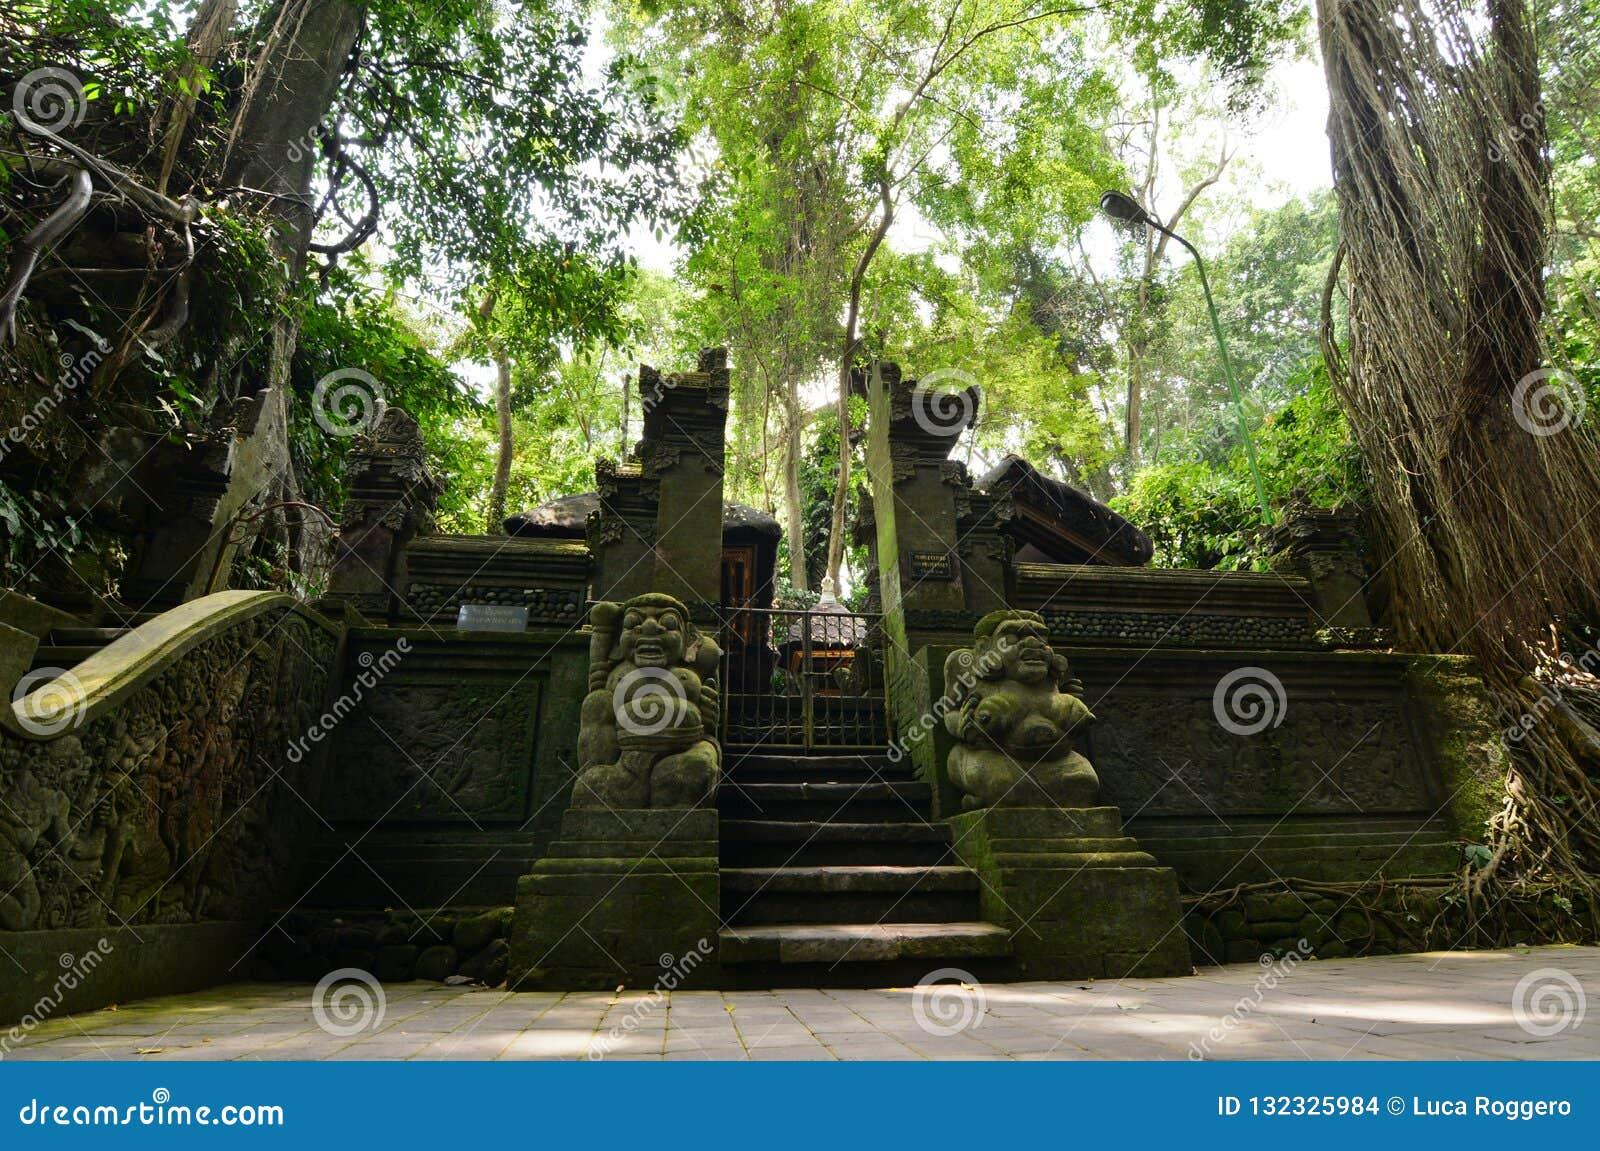 Pura Beji The Temple Of Holy Spring Monkey Forest Padangtegal Village Ubud Bali Indonesia Stock Photo Image Of Holy Green 132325984